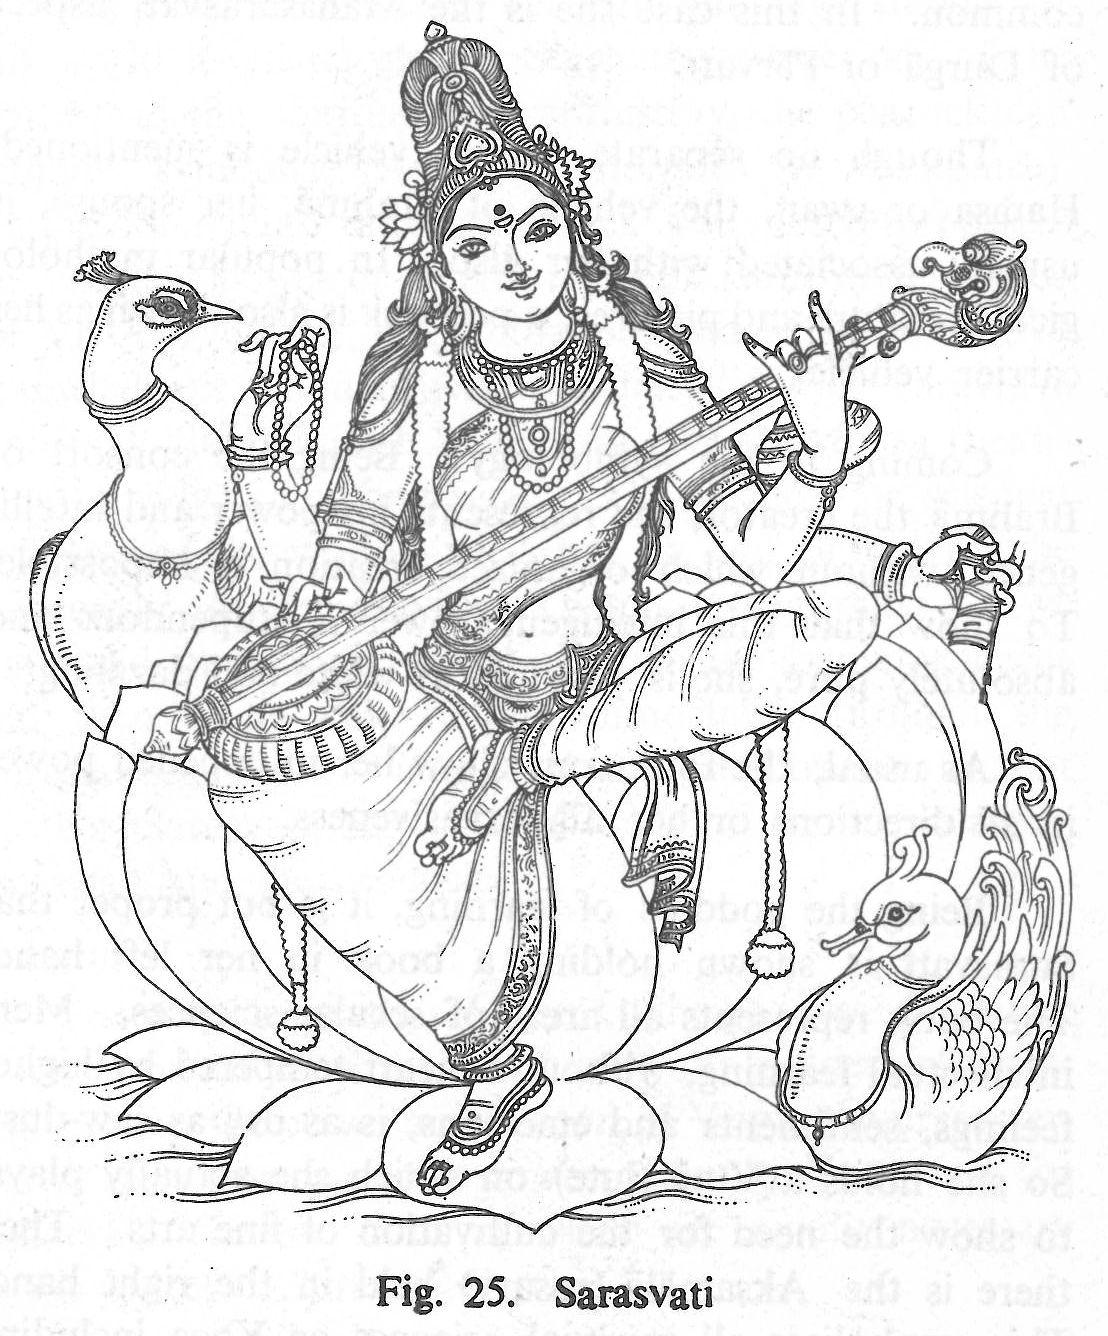 Sarasvati | Hindu Gods Coloring Book | Pinterest | Sketches, Indian ...